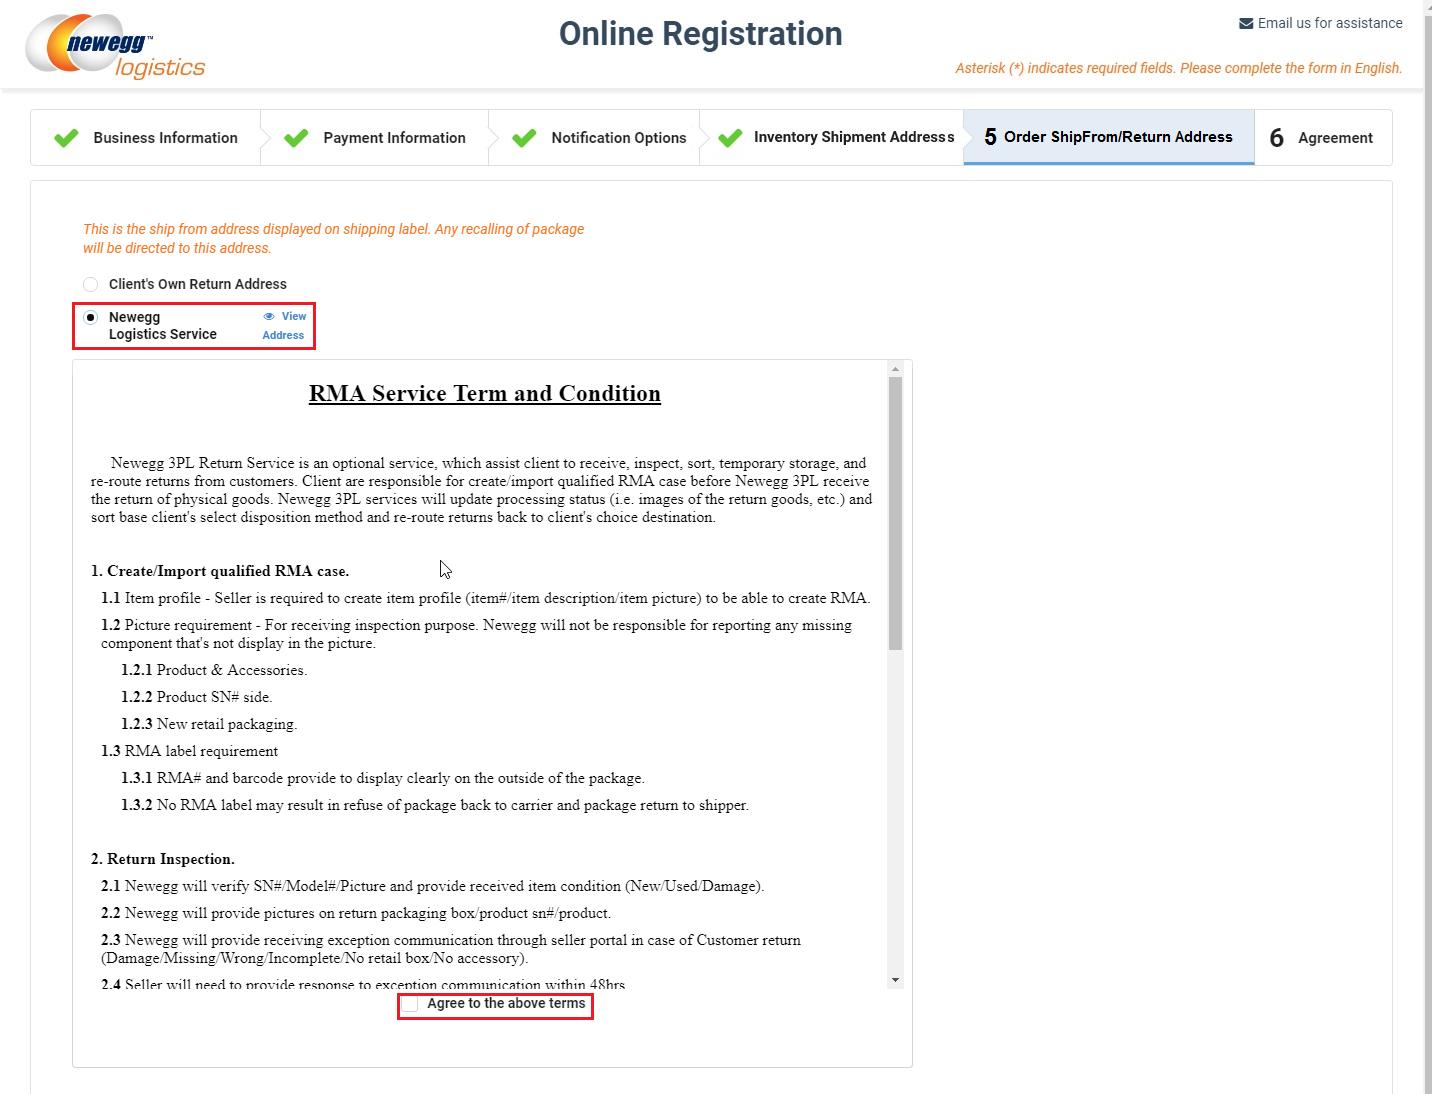 How to register - Newegg Logistics Knowledge Base